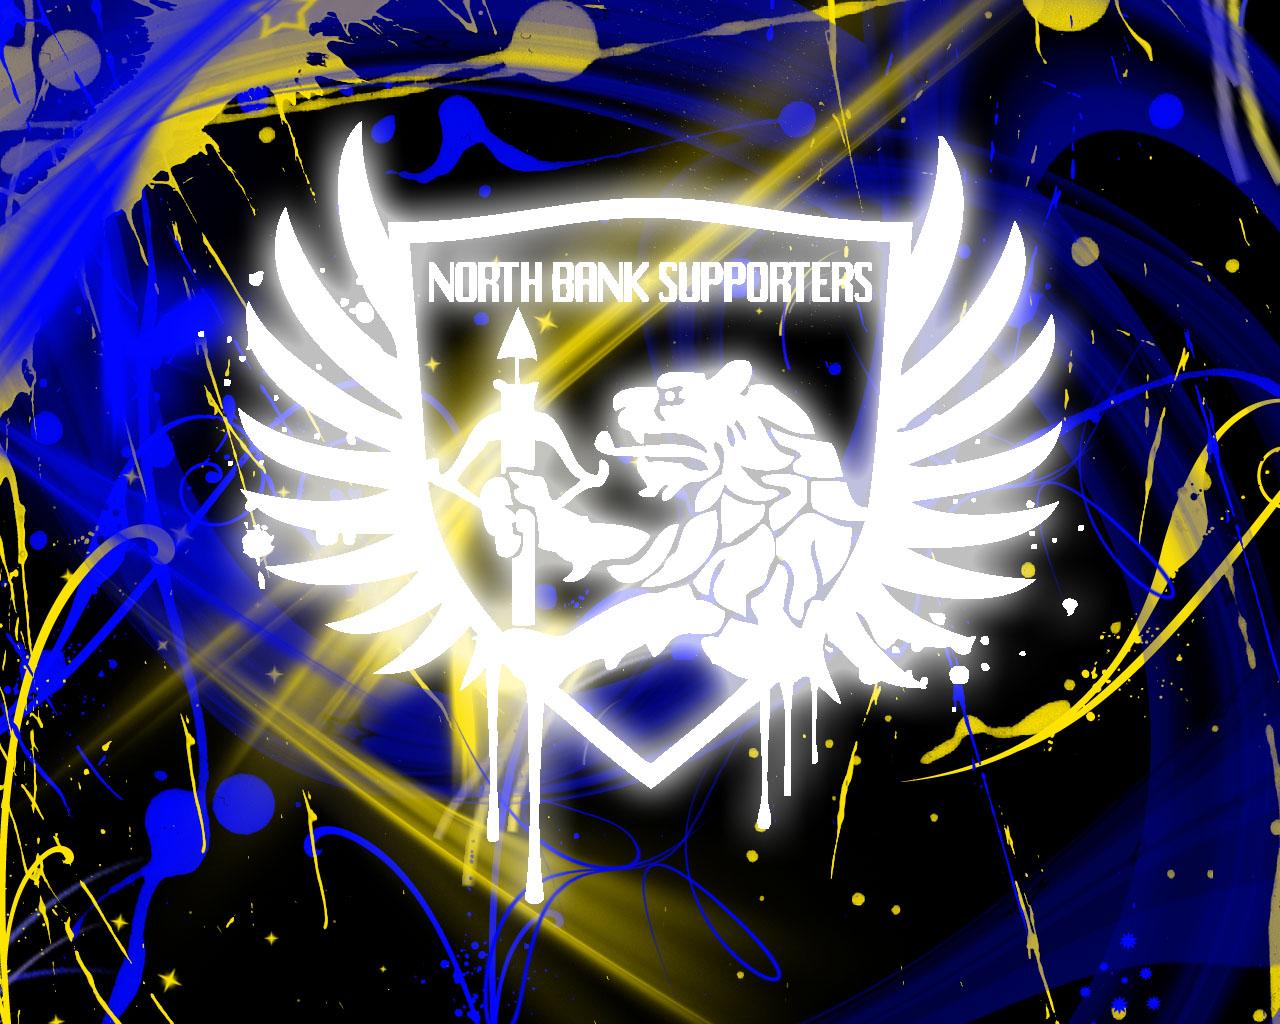 Northbanksse Officiell Supporterklubb Till HV71